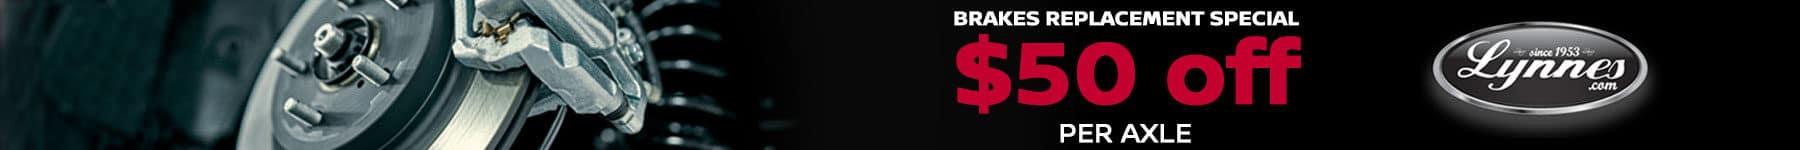 LYNNES-NISSAN-BRAKES-1800X150